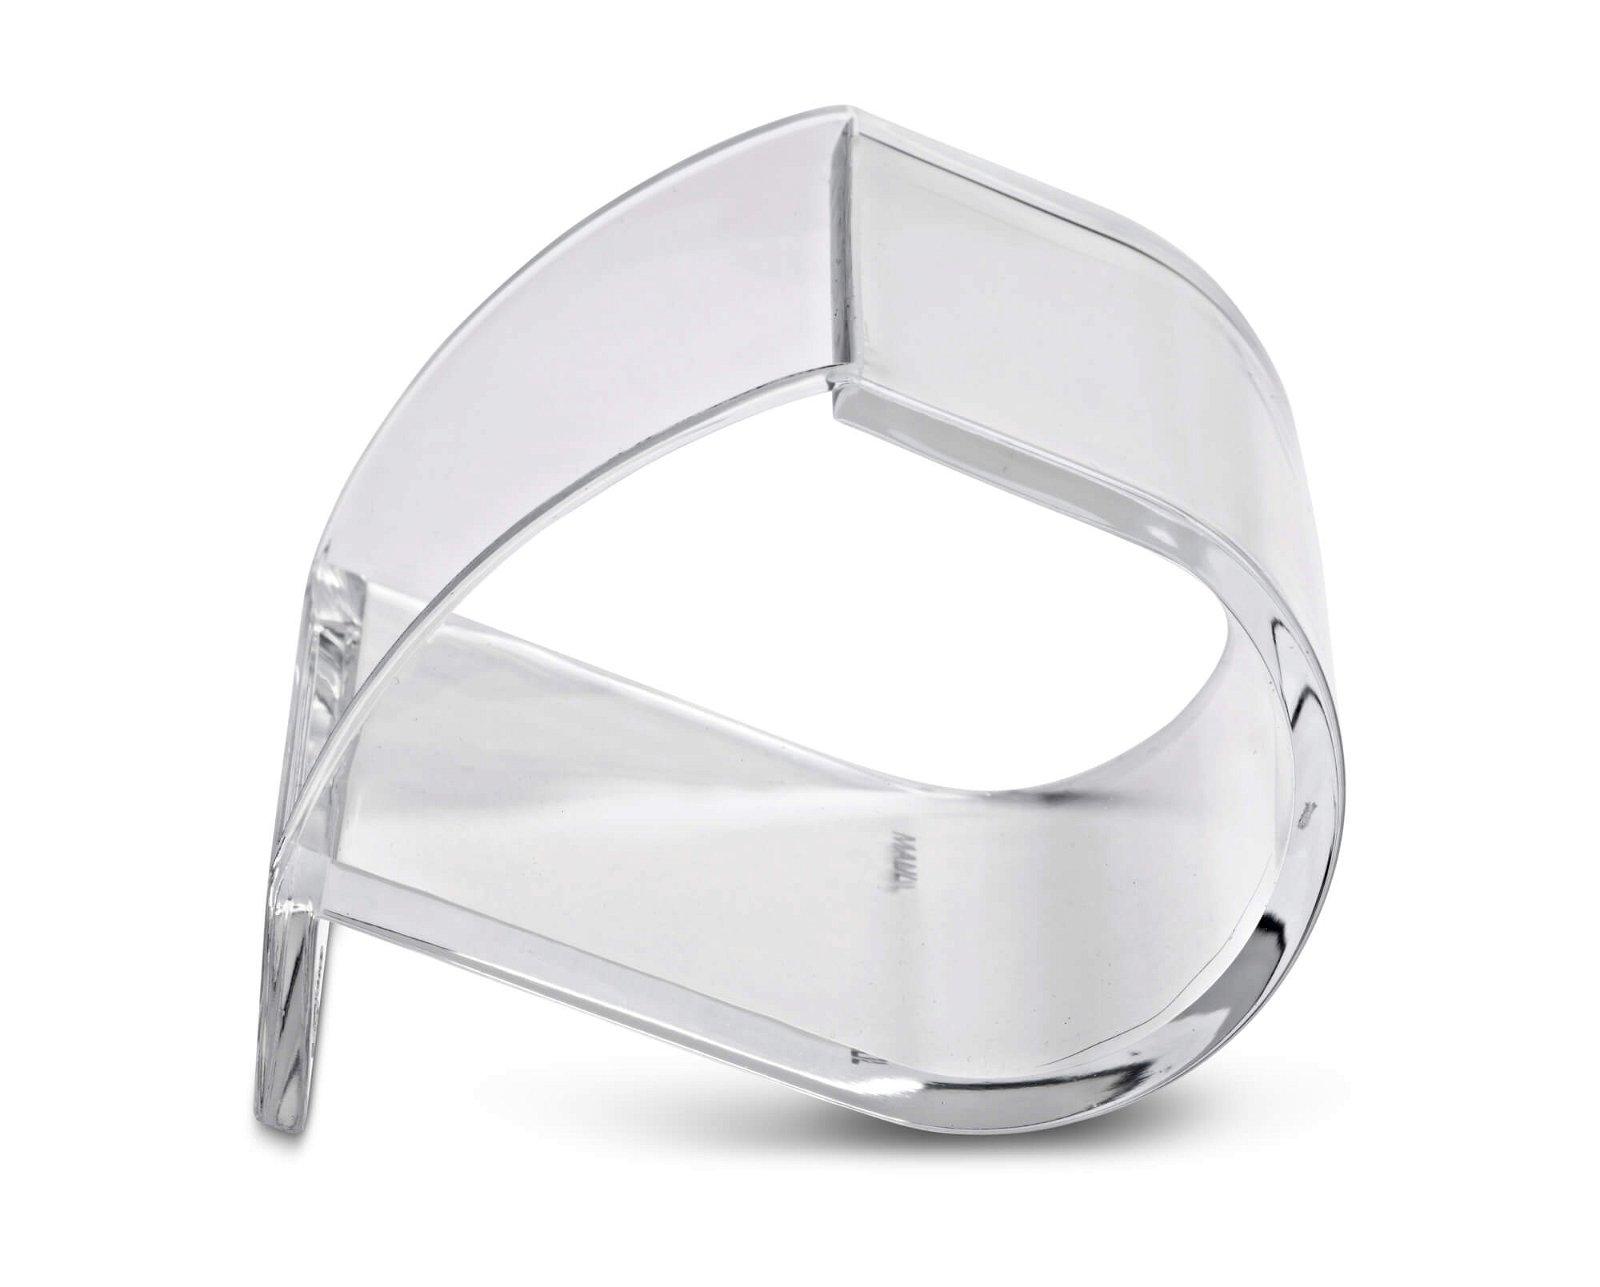 Acryl-Klammernspender, glasklar